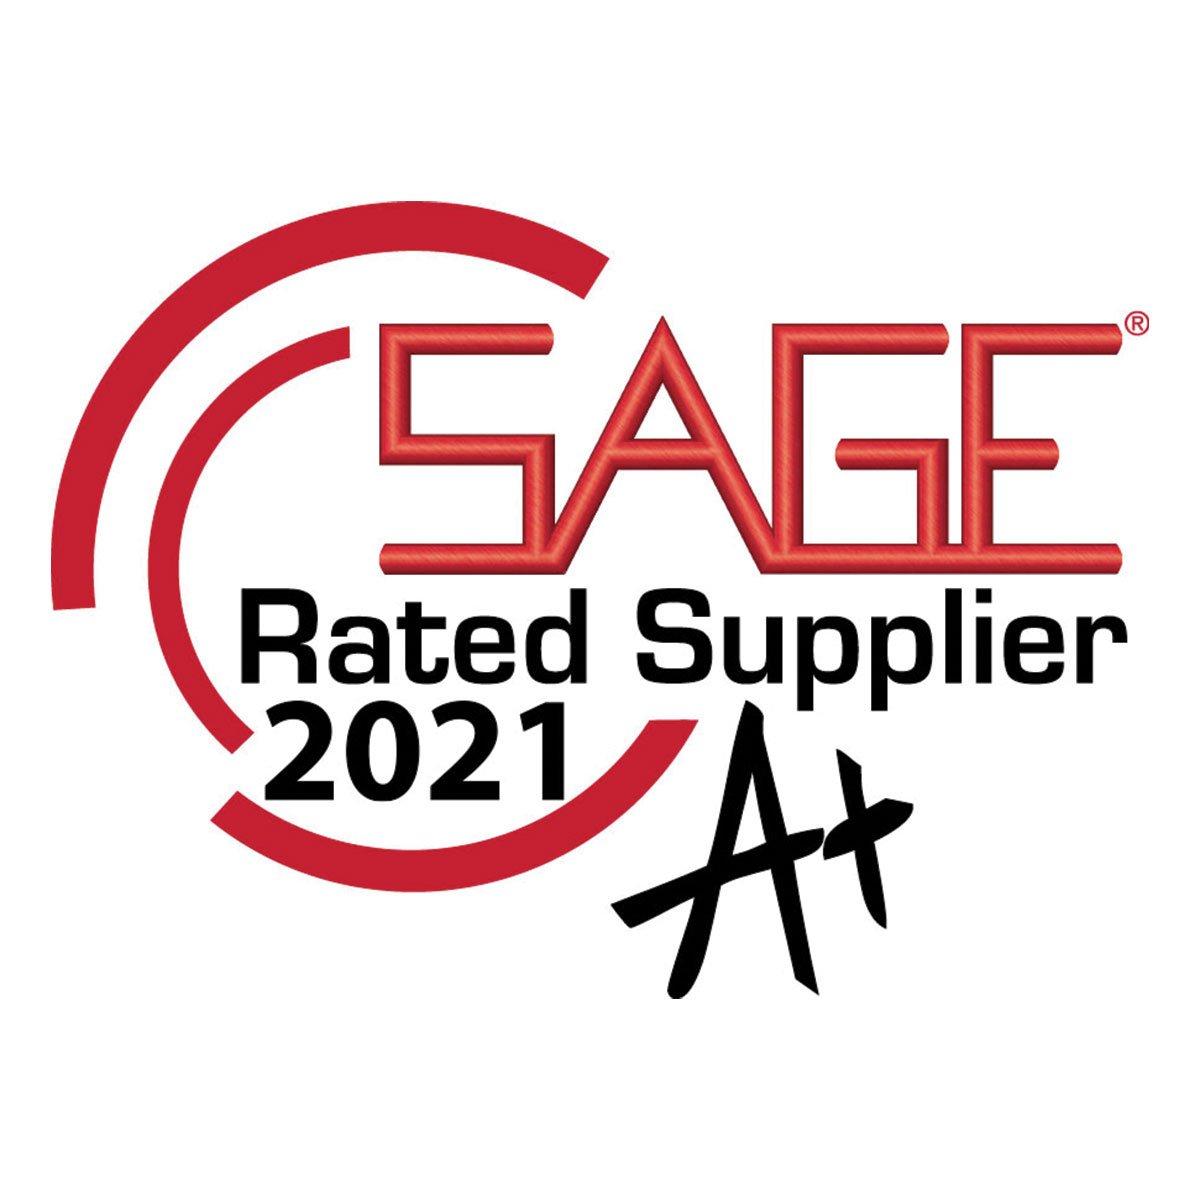 https://www.chocolate2.com/wp-content/uploads/2021/04/Sage_2021.jpg